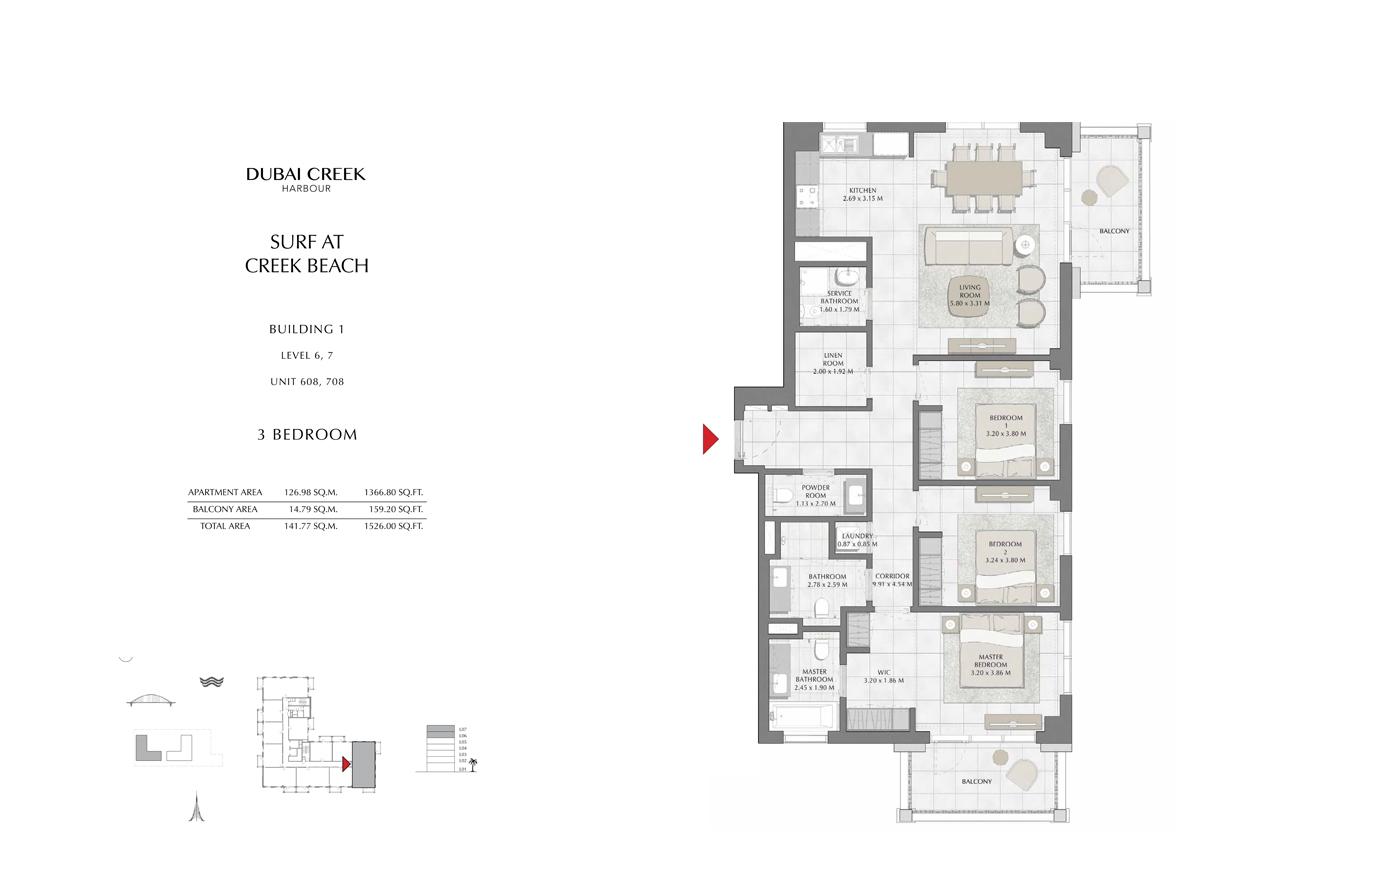 Building 1, 1 Bedroom, Level 6,7 Size 1526 Sq Ft